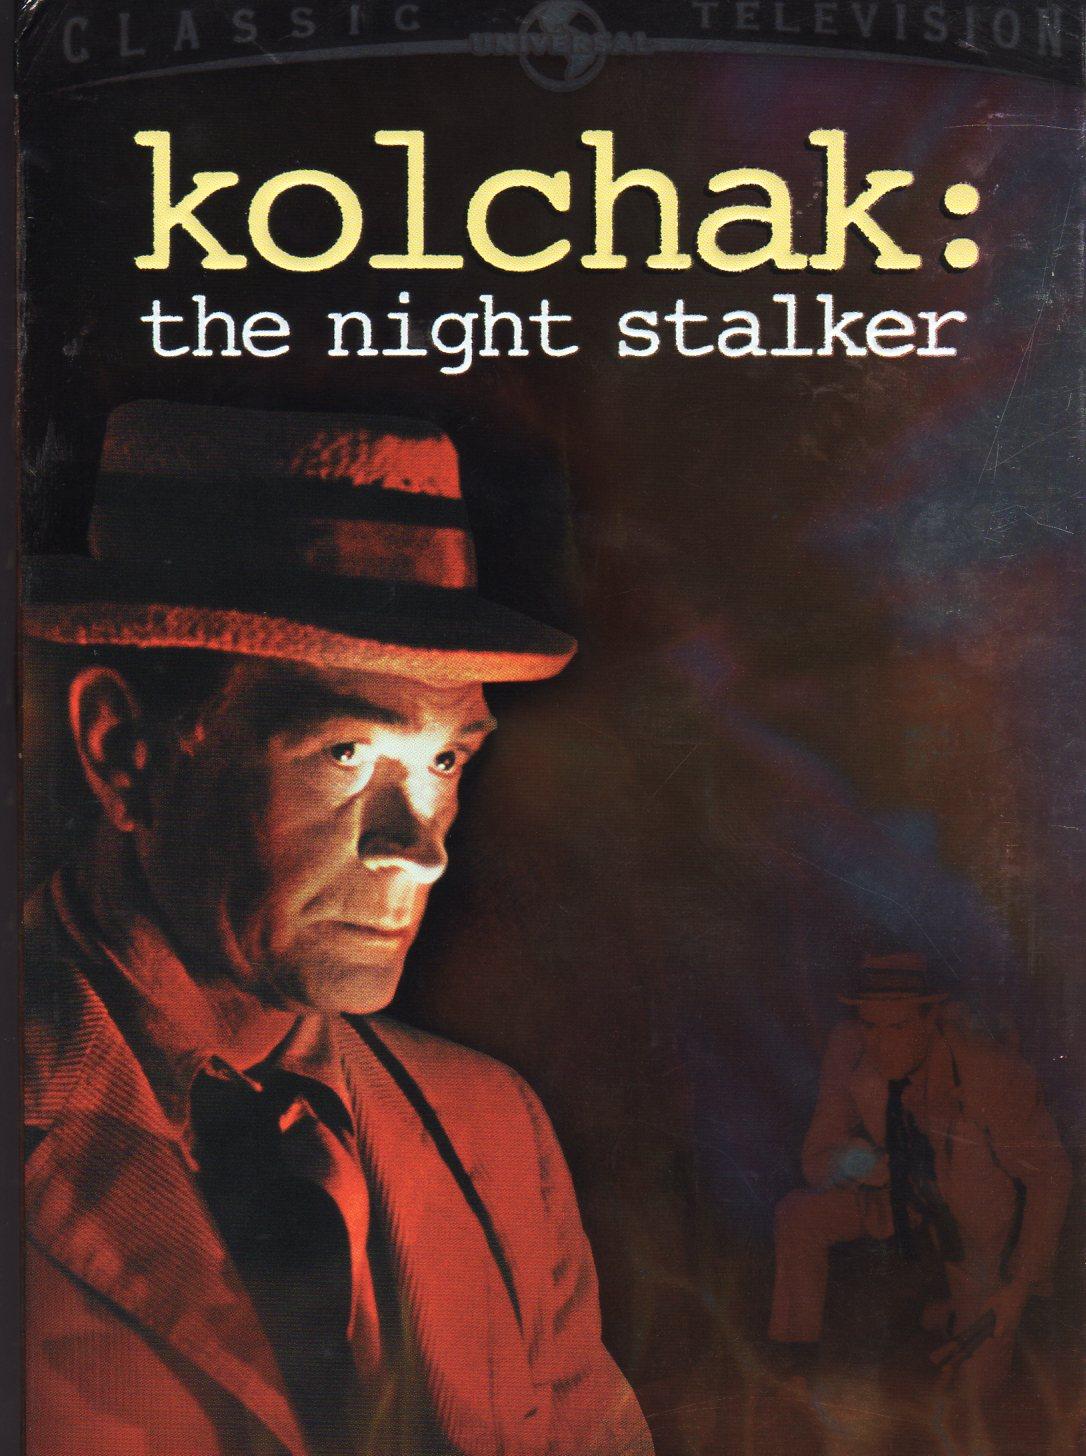 Kolchak - The Night Stalker (1974) - Scorpio TV